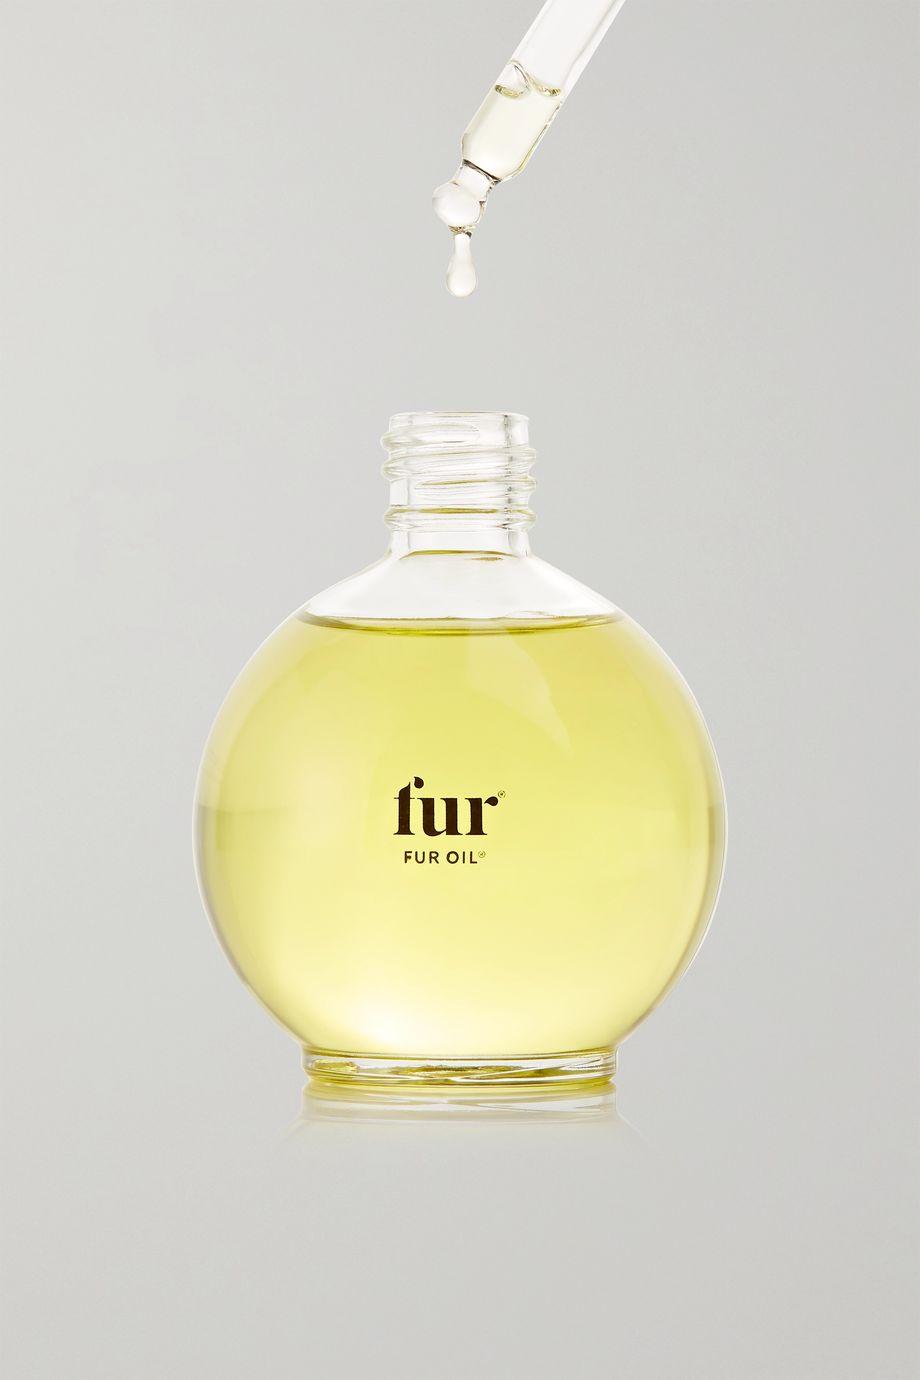 FUR Fur Oil, 75ml